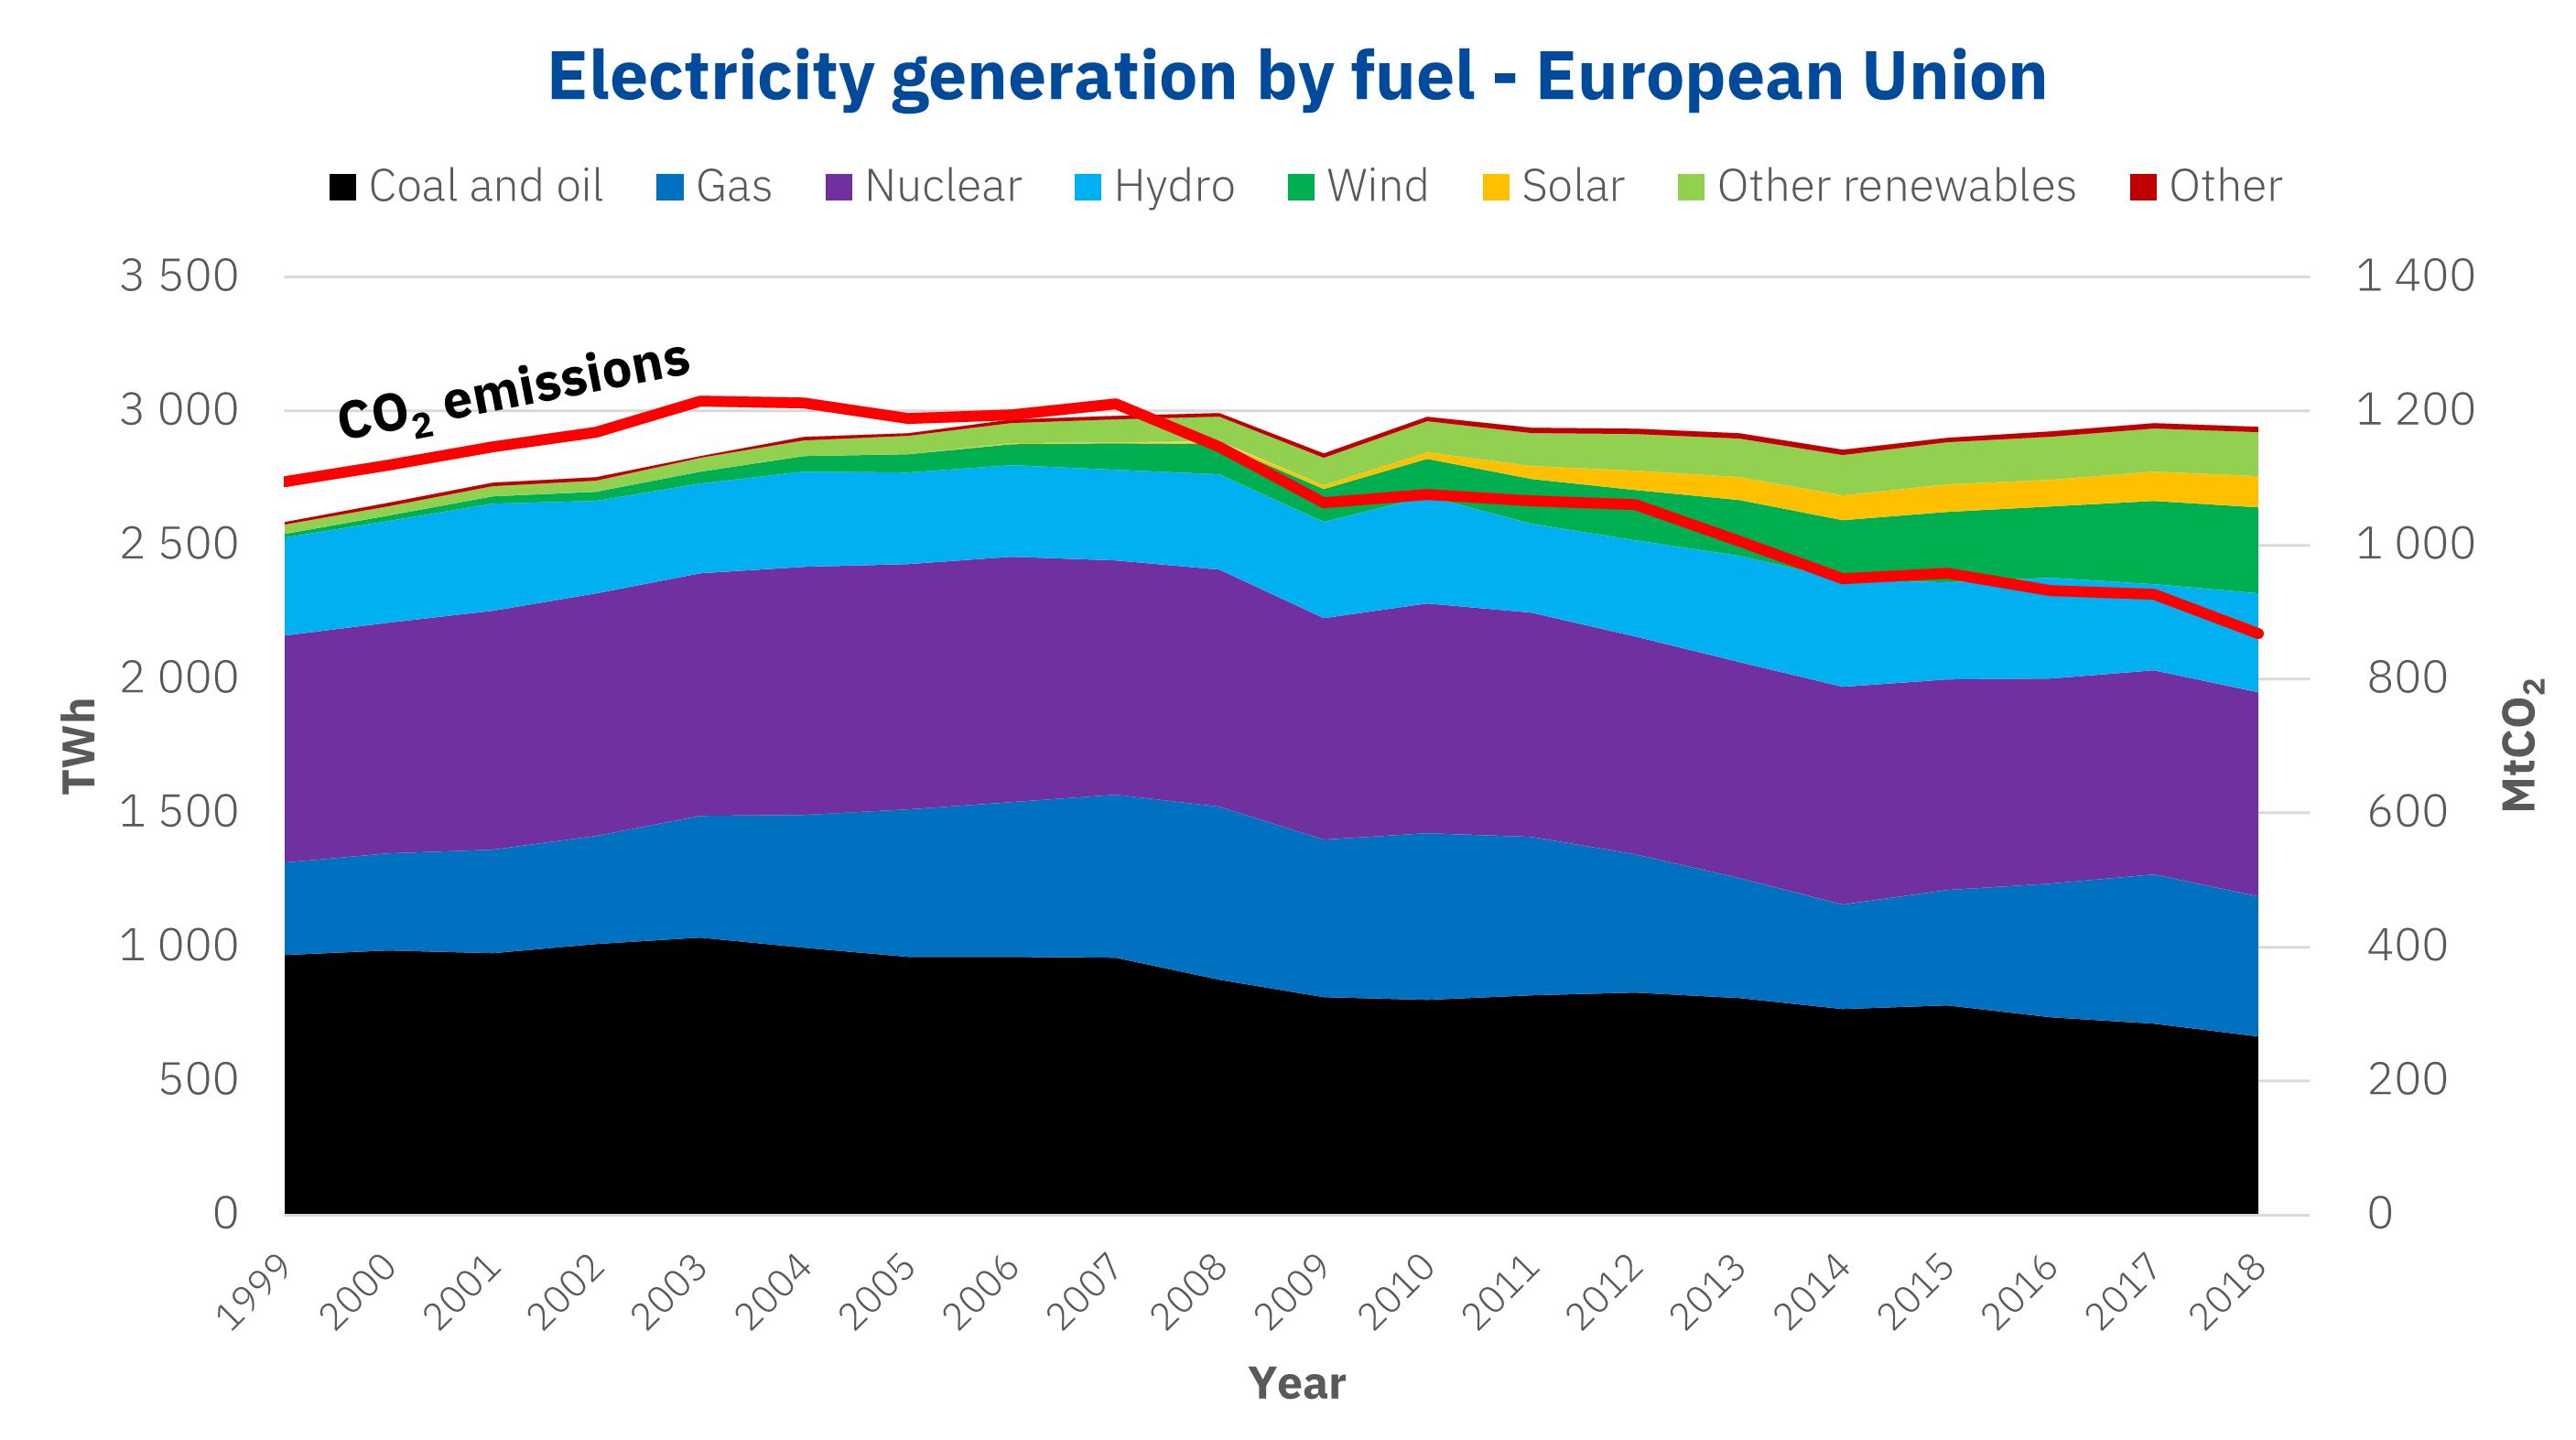 AleaSoft - Electricity generation European Union CO2